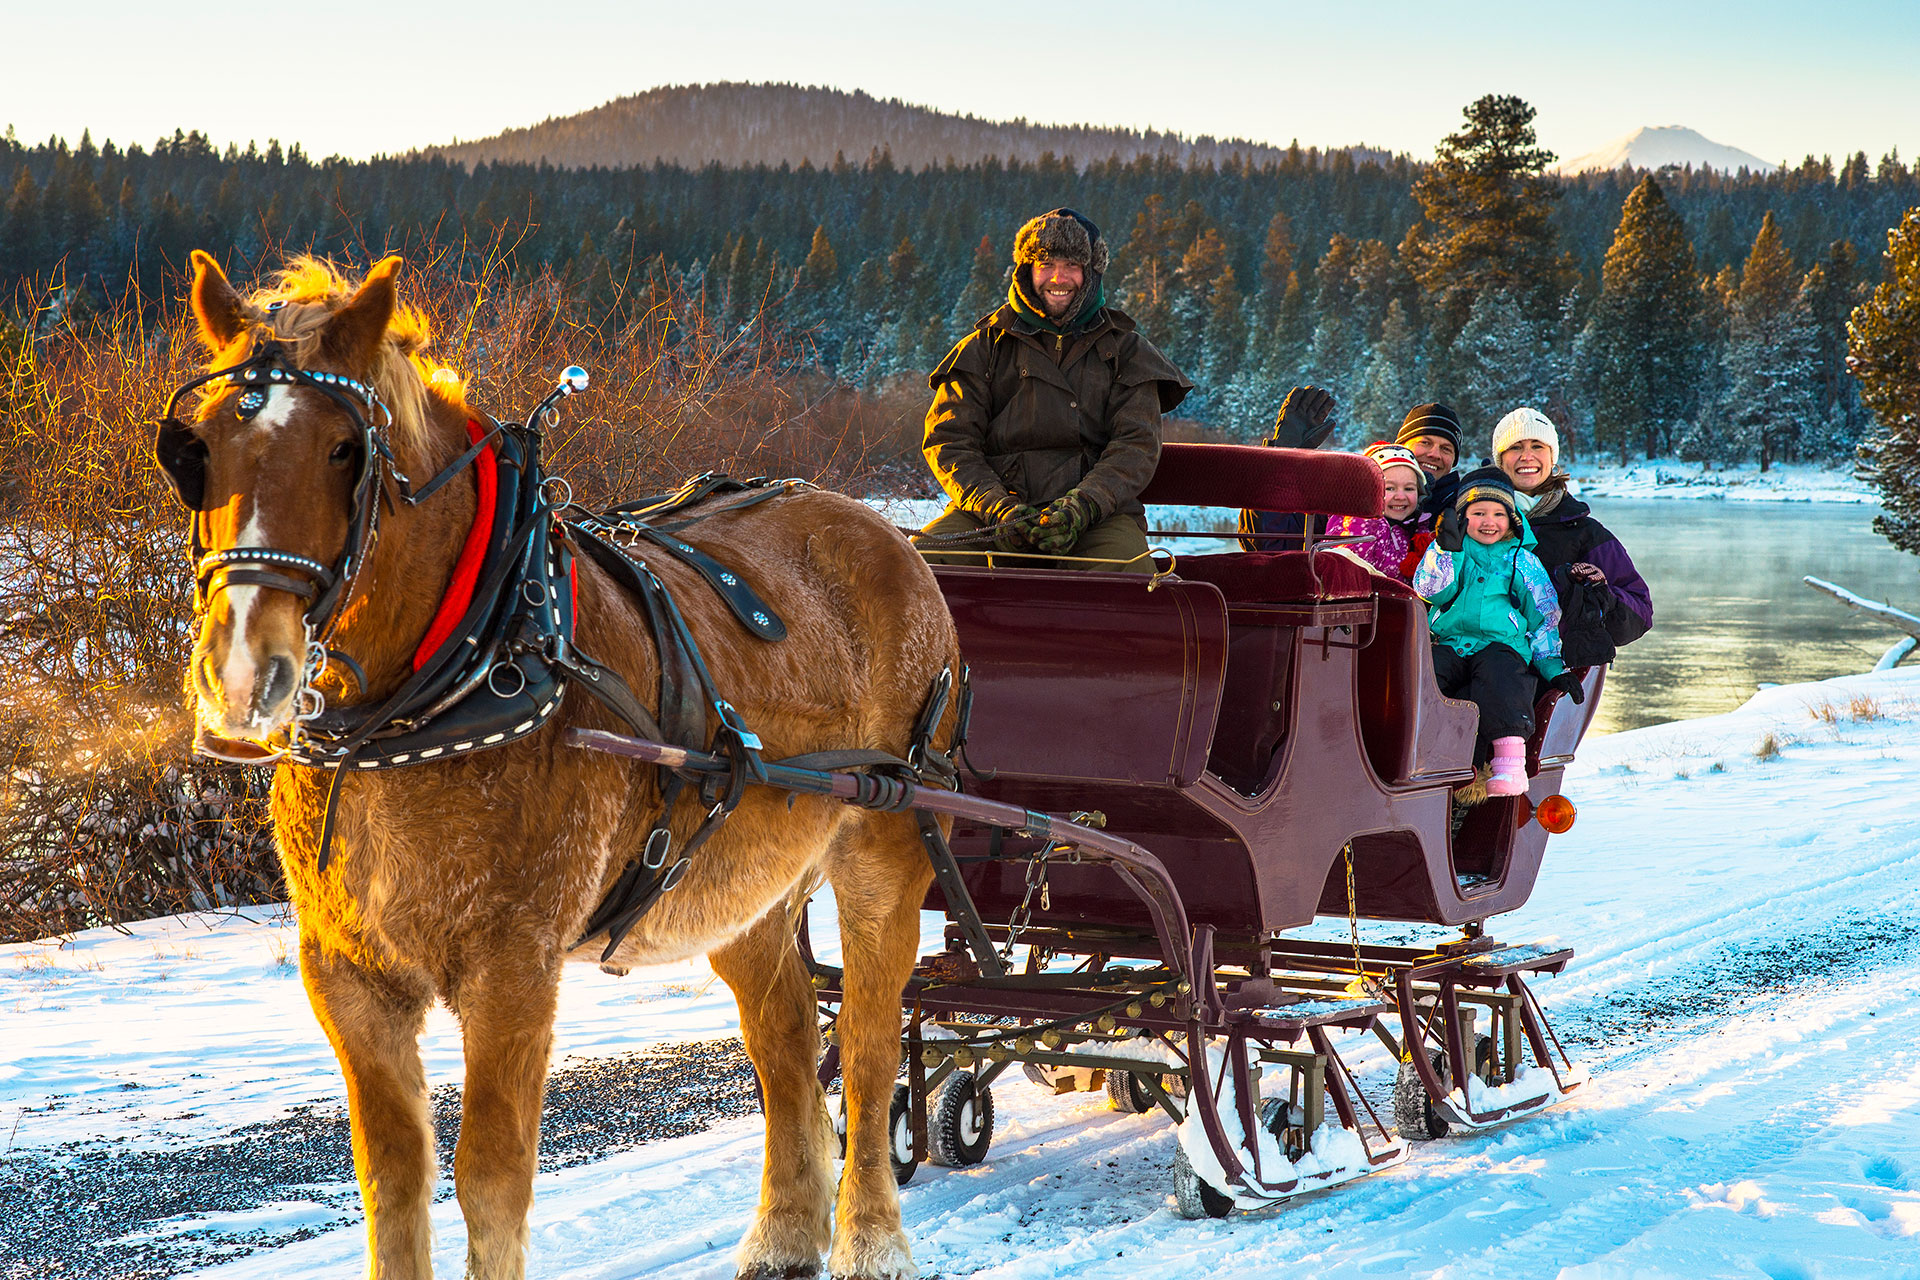 Horsedrawn Sleigh Ride at Sunriver Resort in Oregon